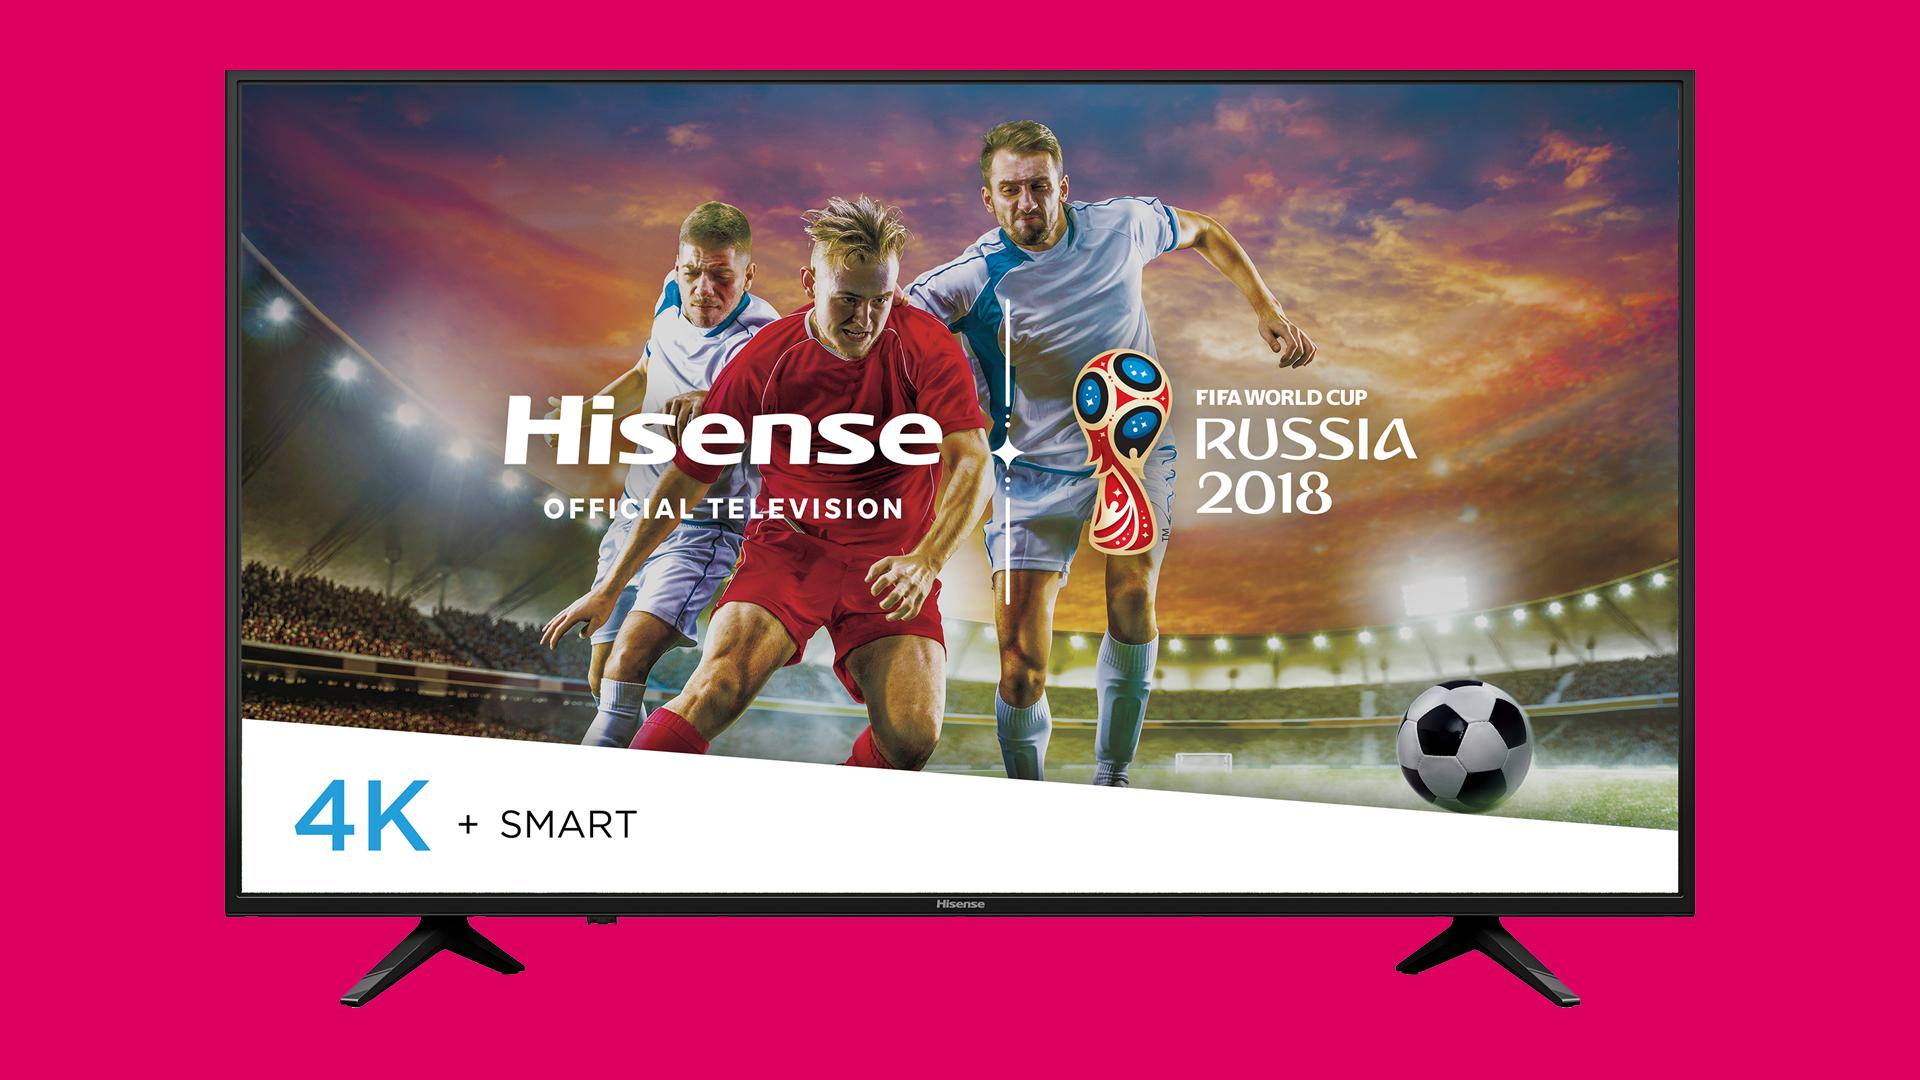 Hisense H6 Series 4K UHD Smart TV (2018)